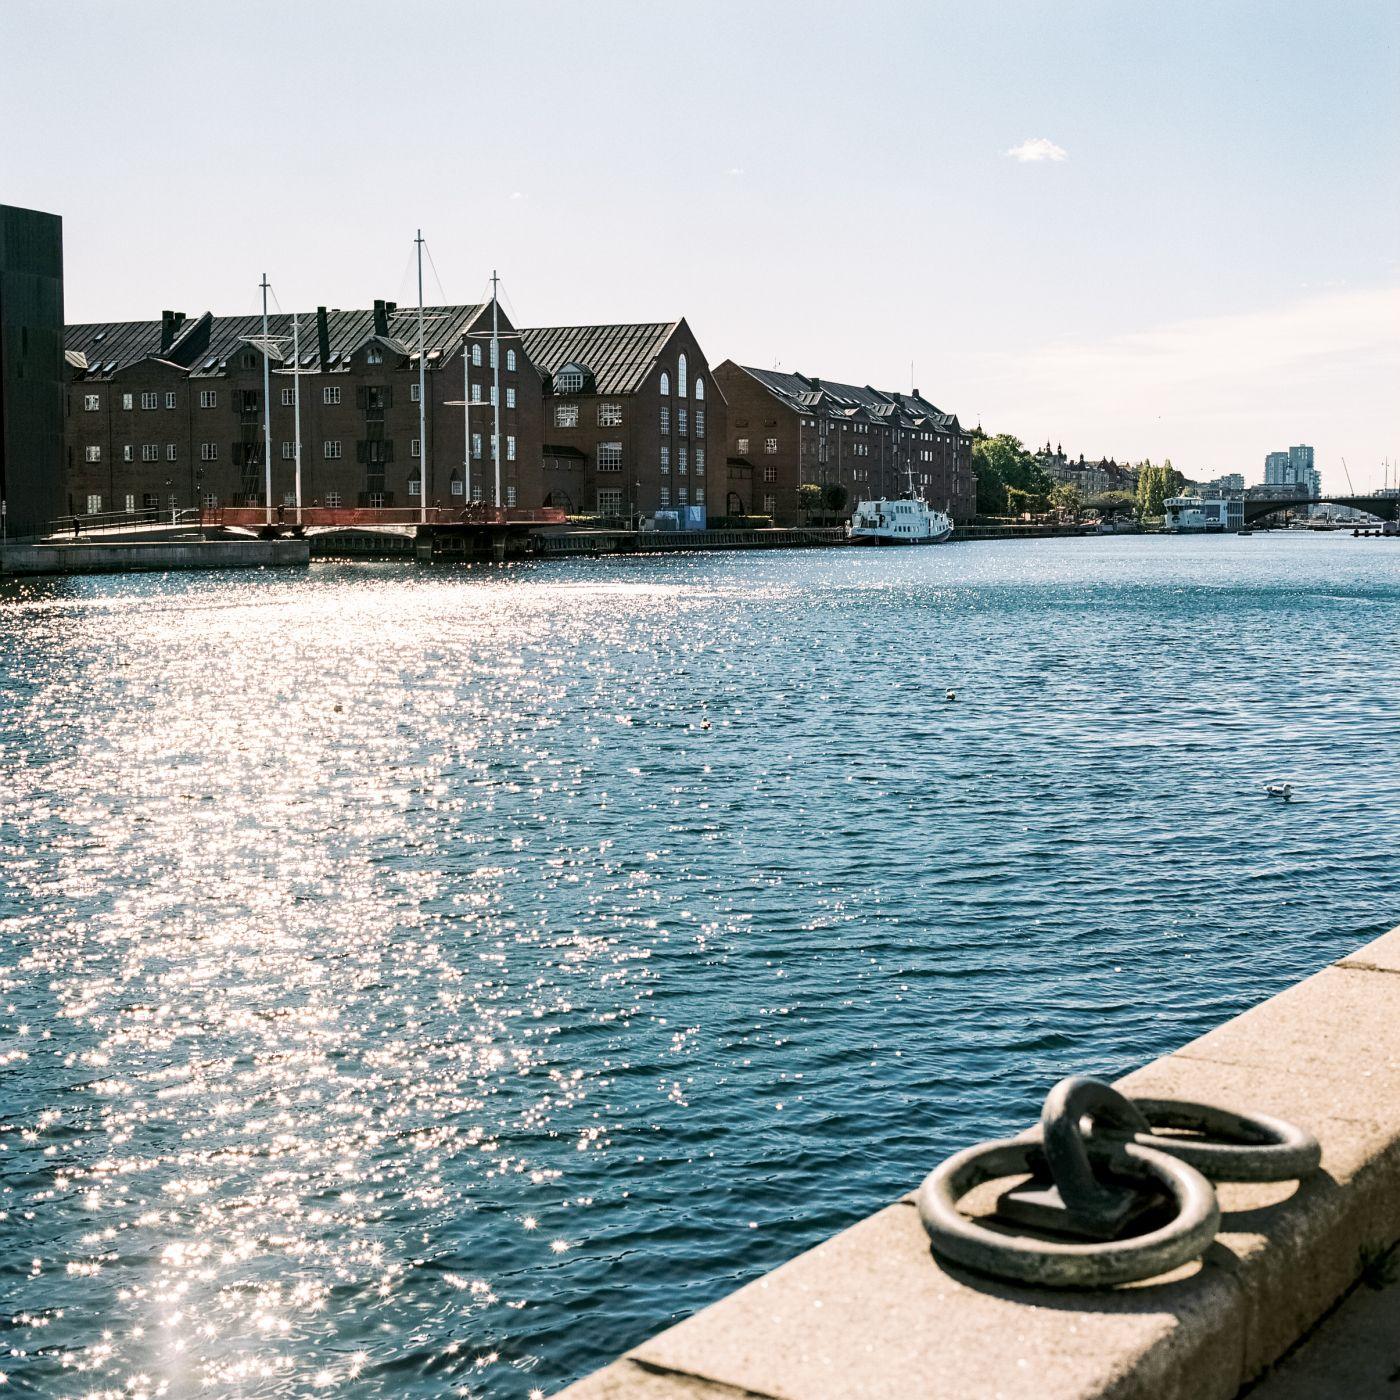 Cirkel bro (Circle bridge) by Olafur Eliasson, Denmark